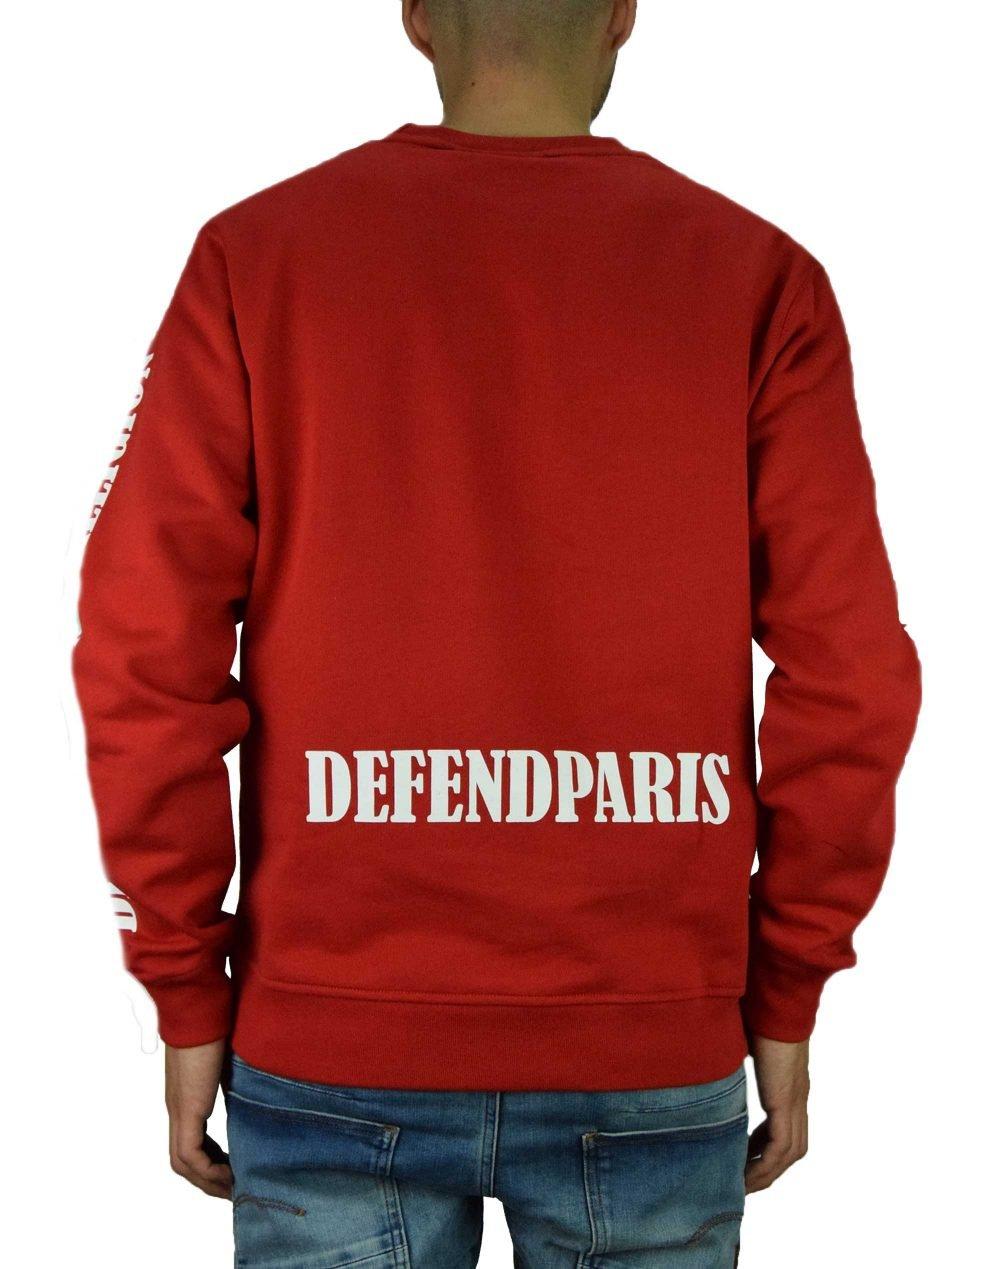 Defend Paris To Be Crew Neck (TOBEX19) Red